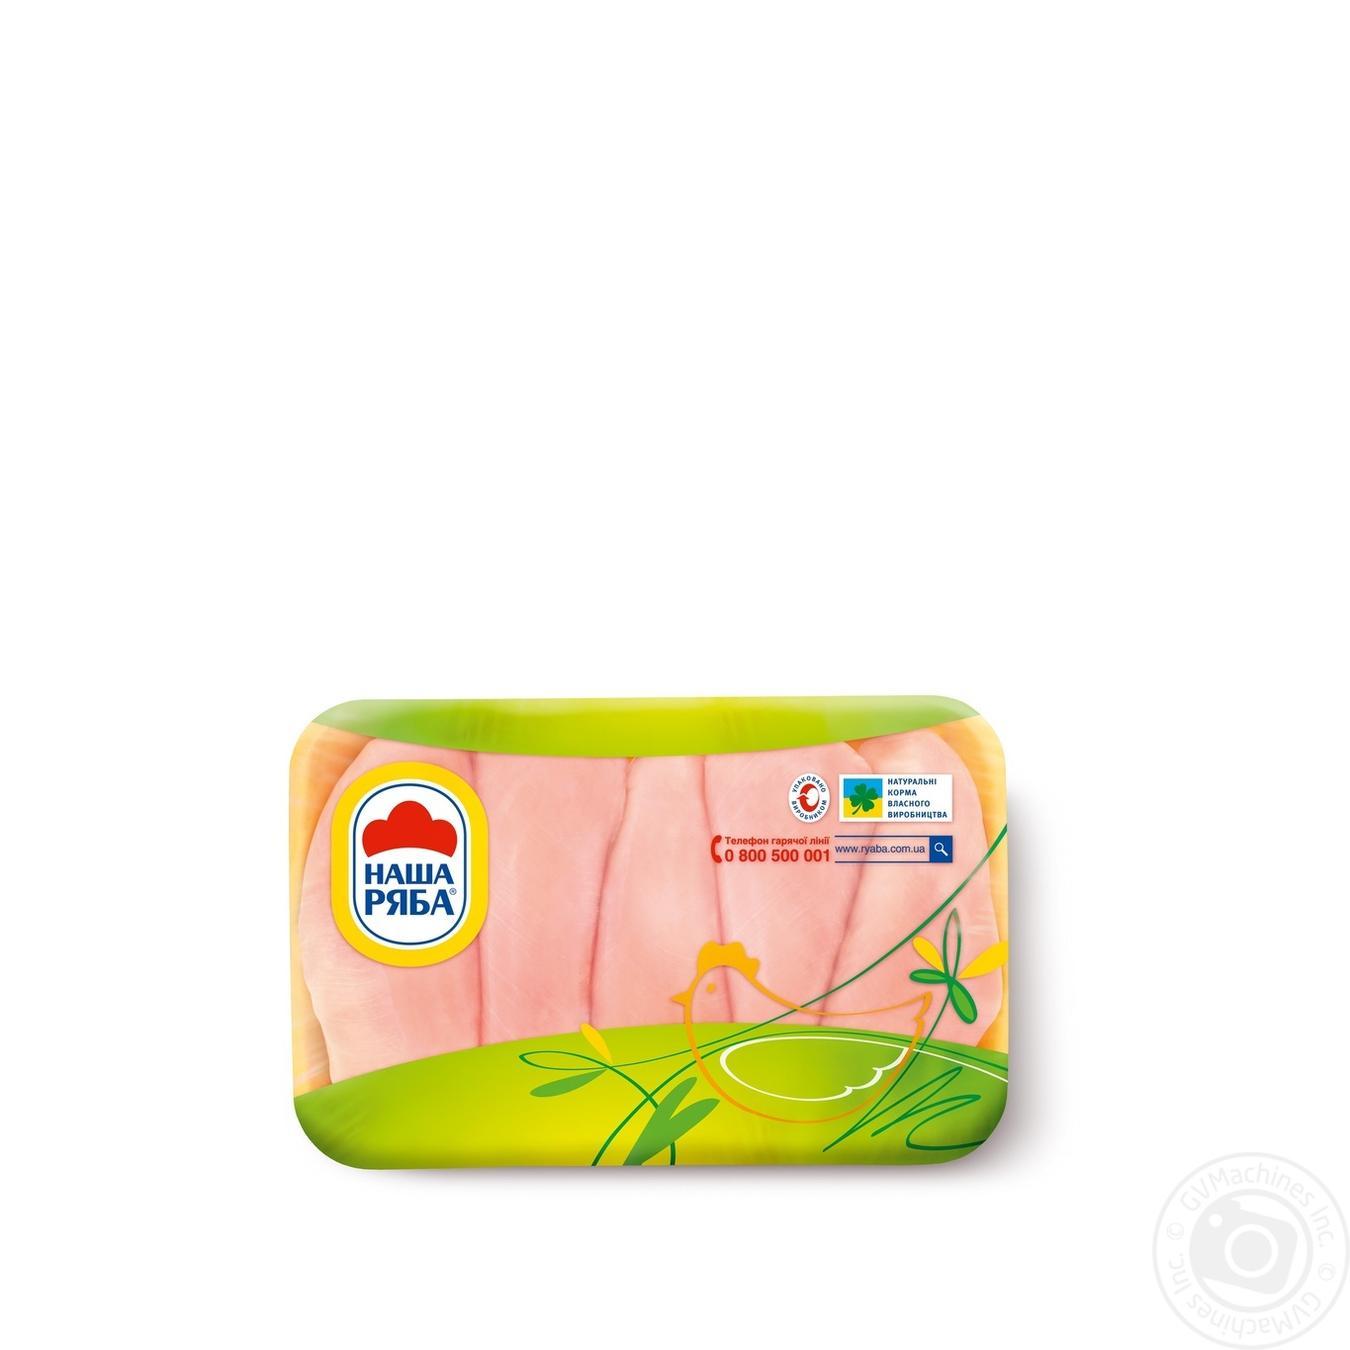 Купить Філе Наша Ряба HALAL курчати-бройлера охолоджене (упаковка СЕС)